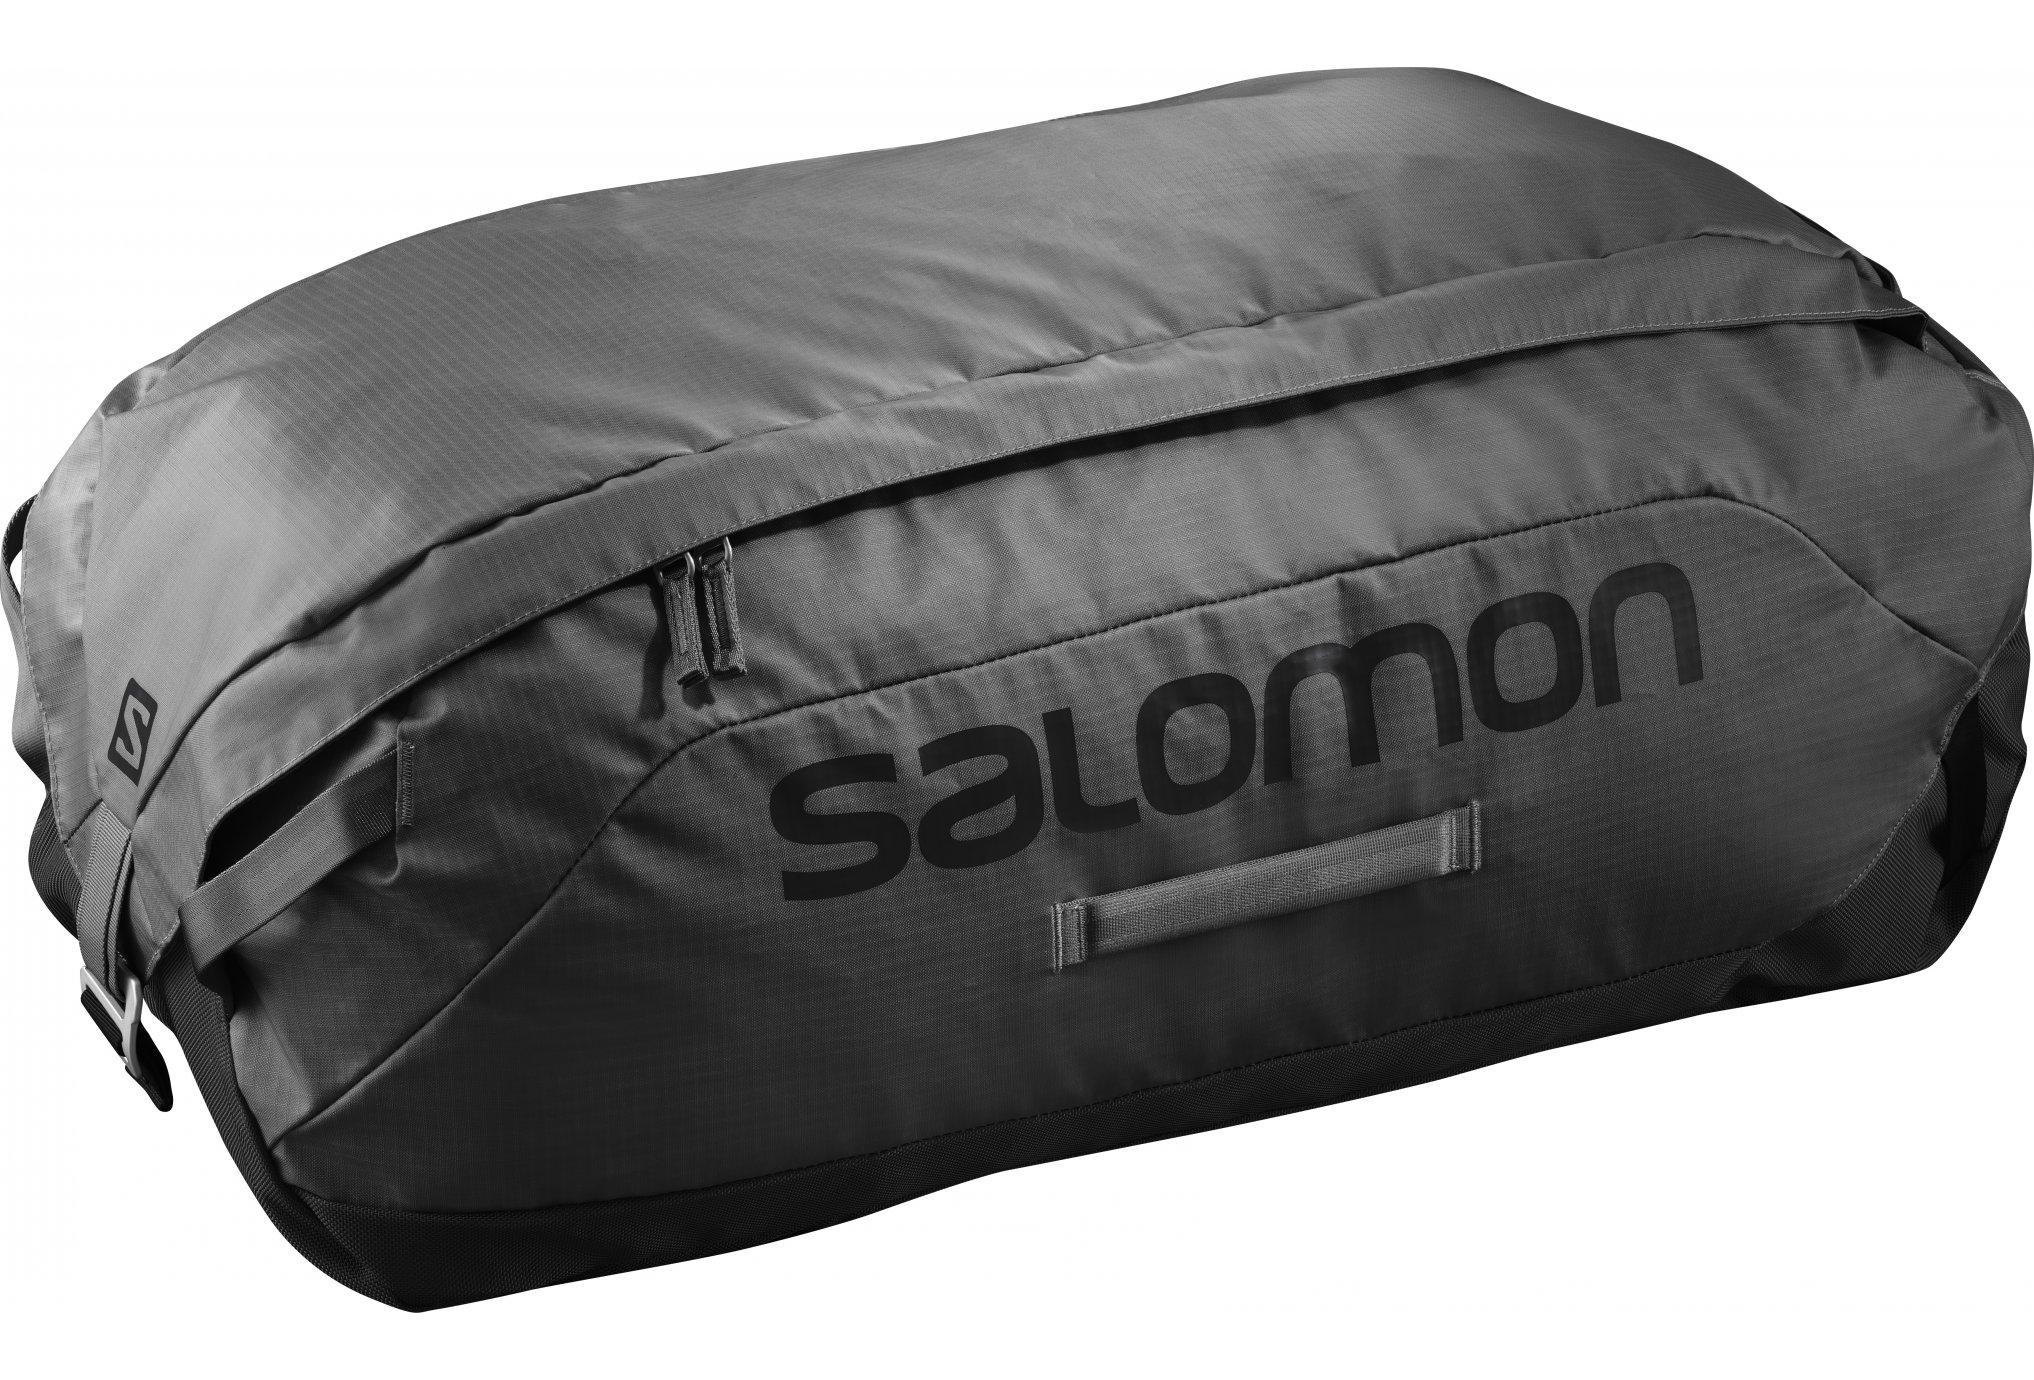 Salomon Outlife Duffel 70 Sac de sport